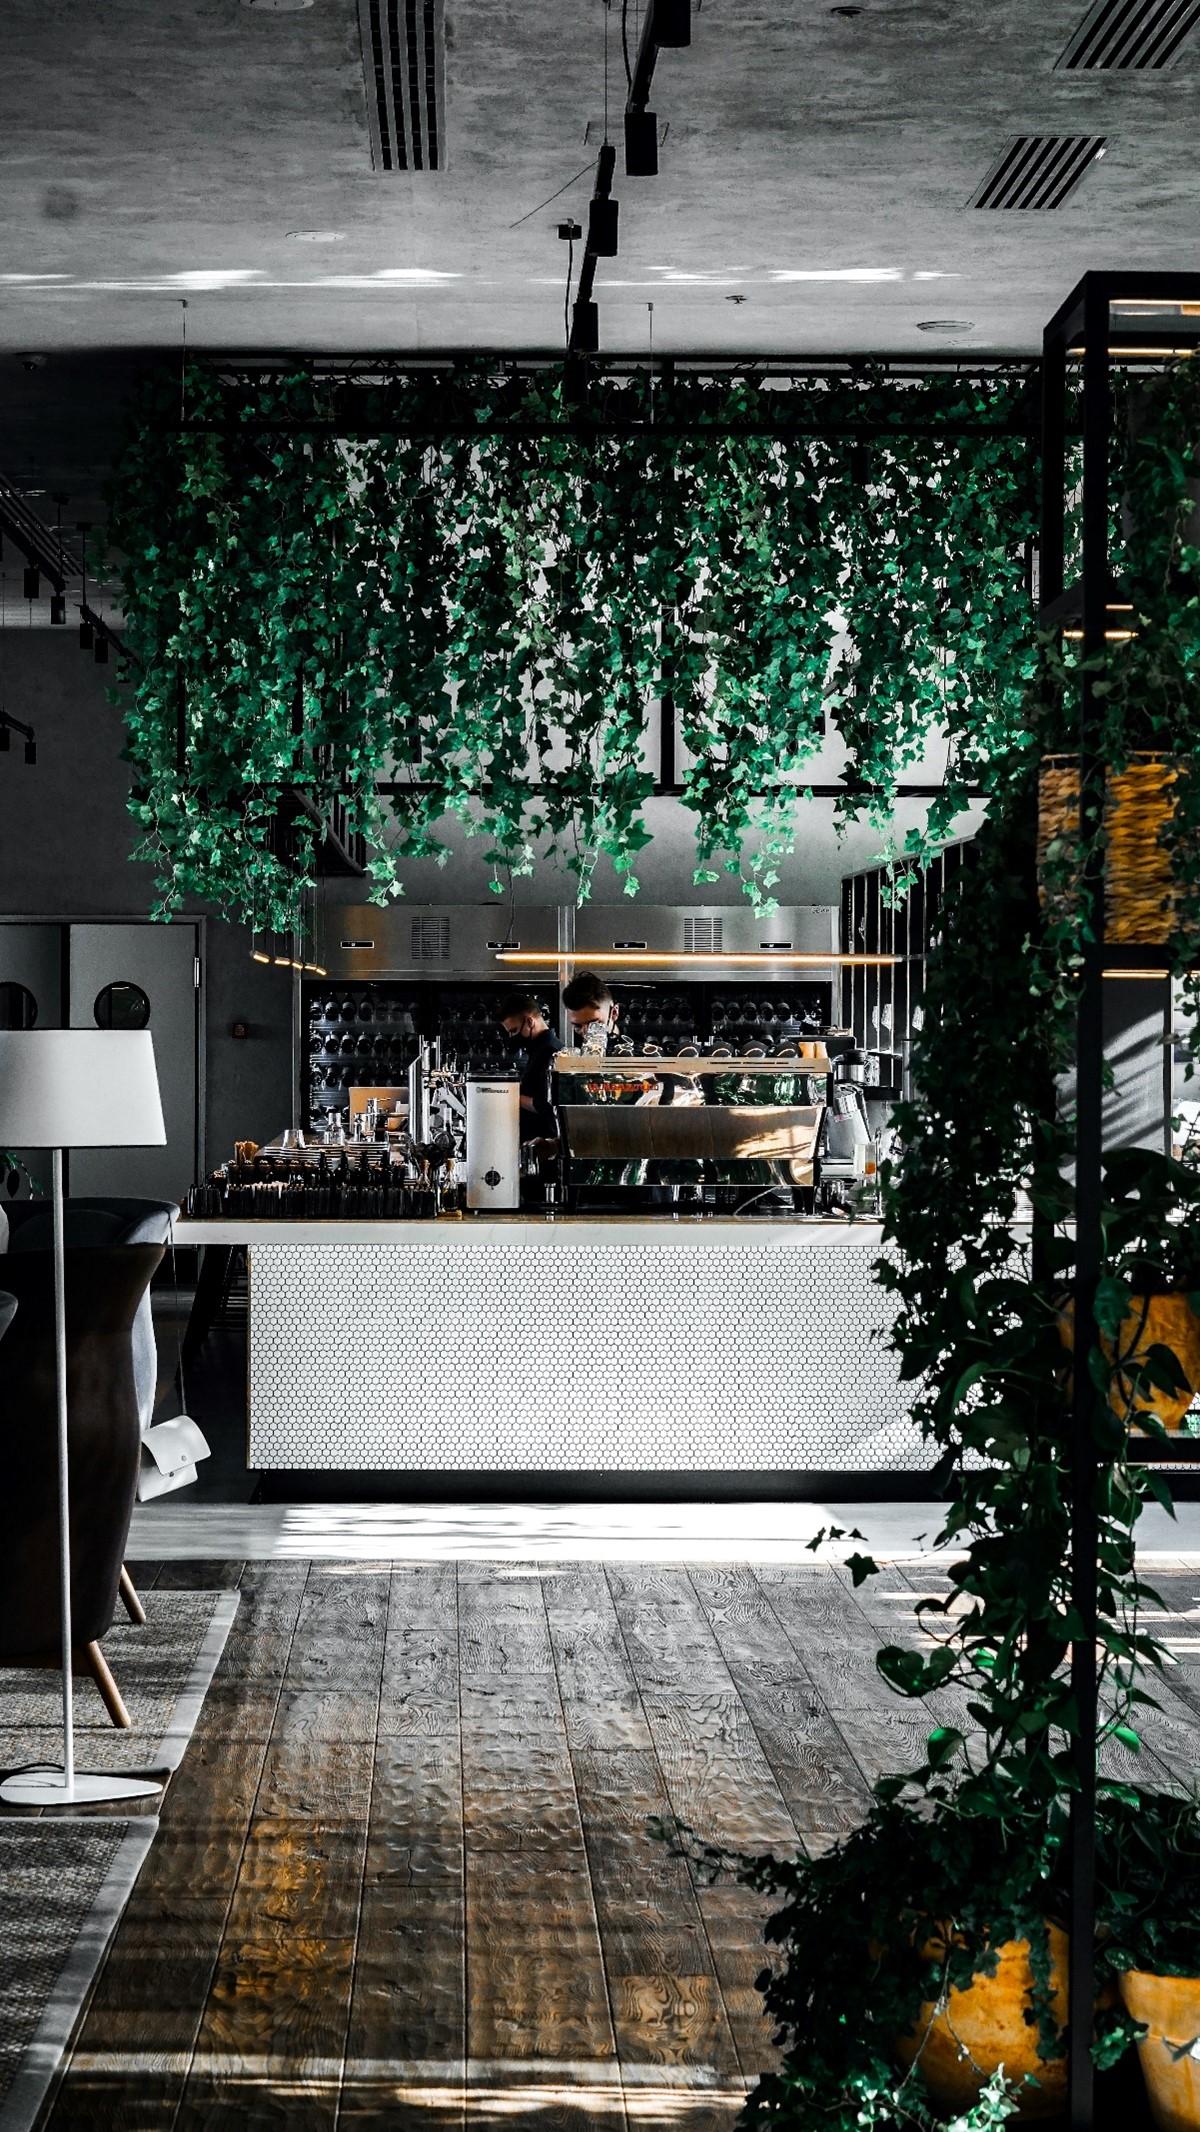 home-bar-hang-greenery